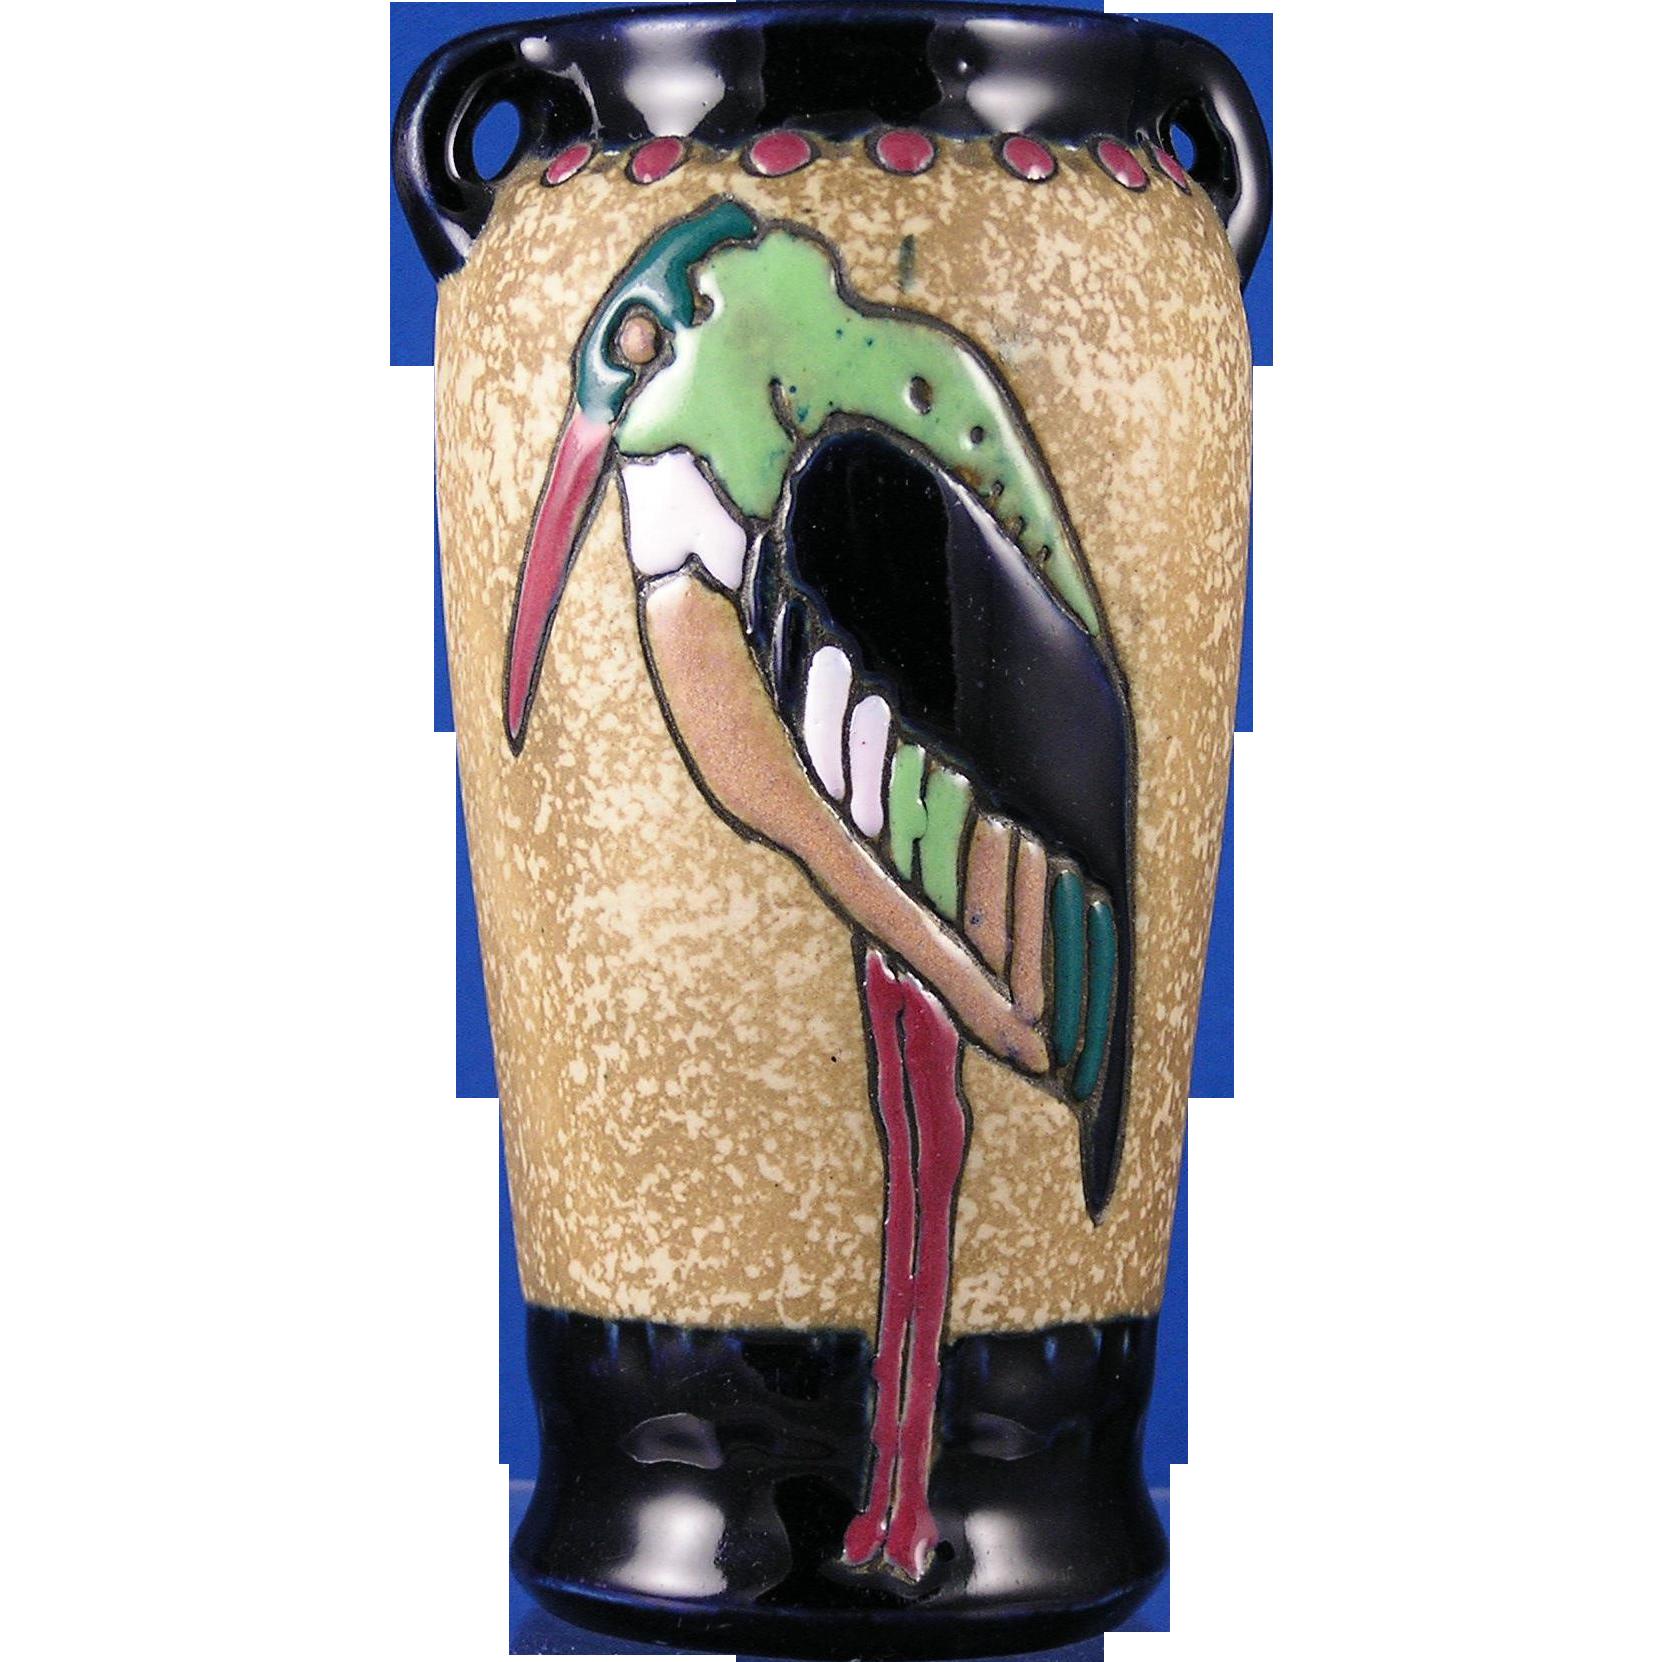 Amphora Austria Campina Arts & Crafts Stork Design Vase (c.1905-1910)